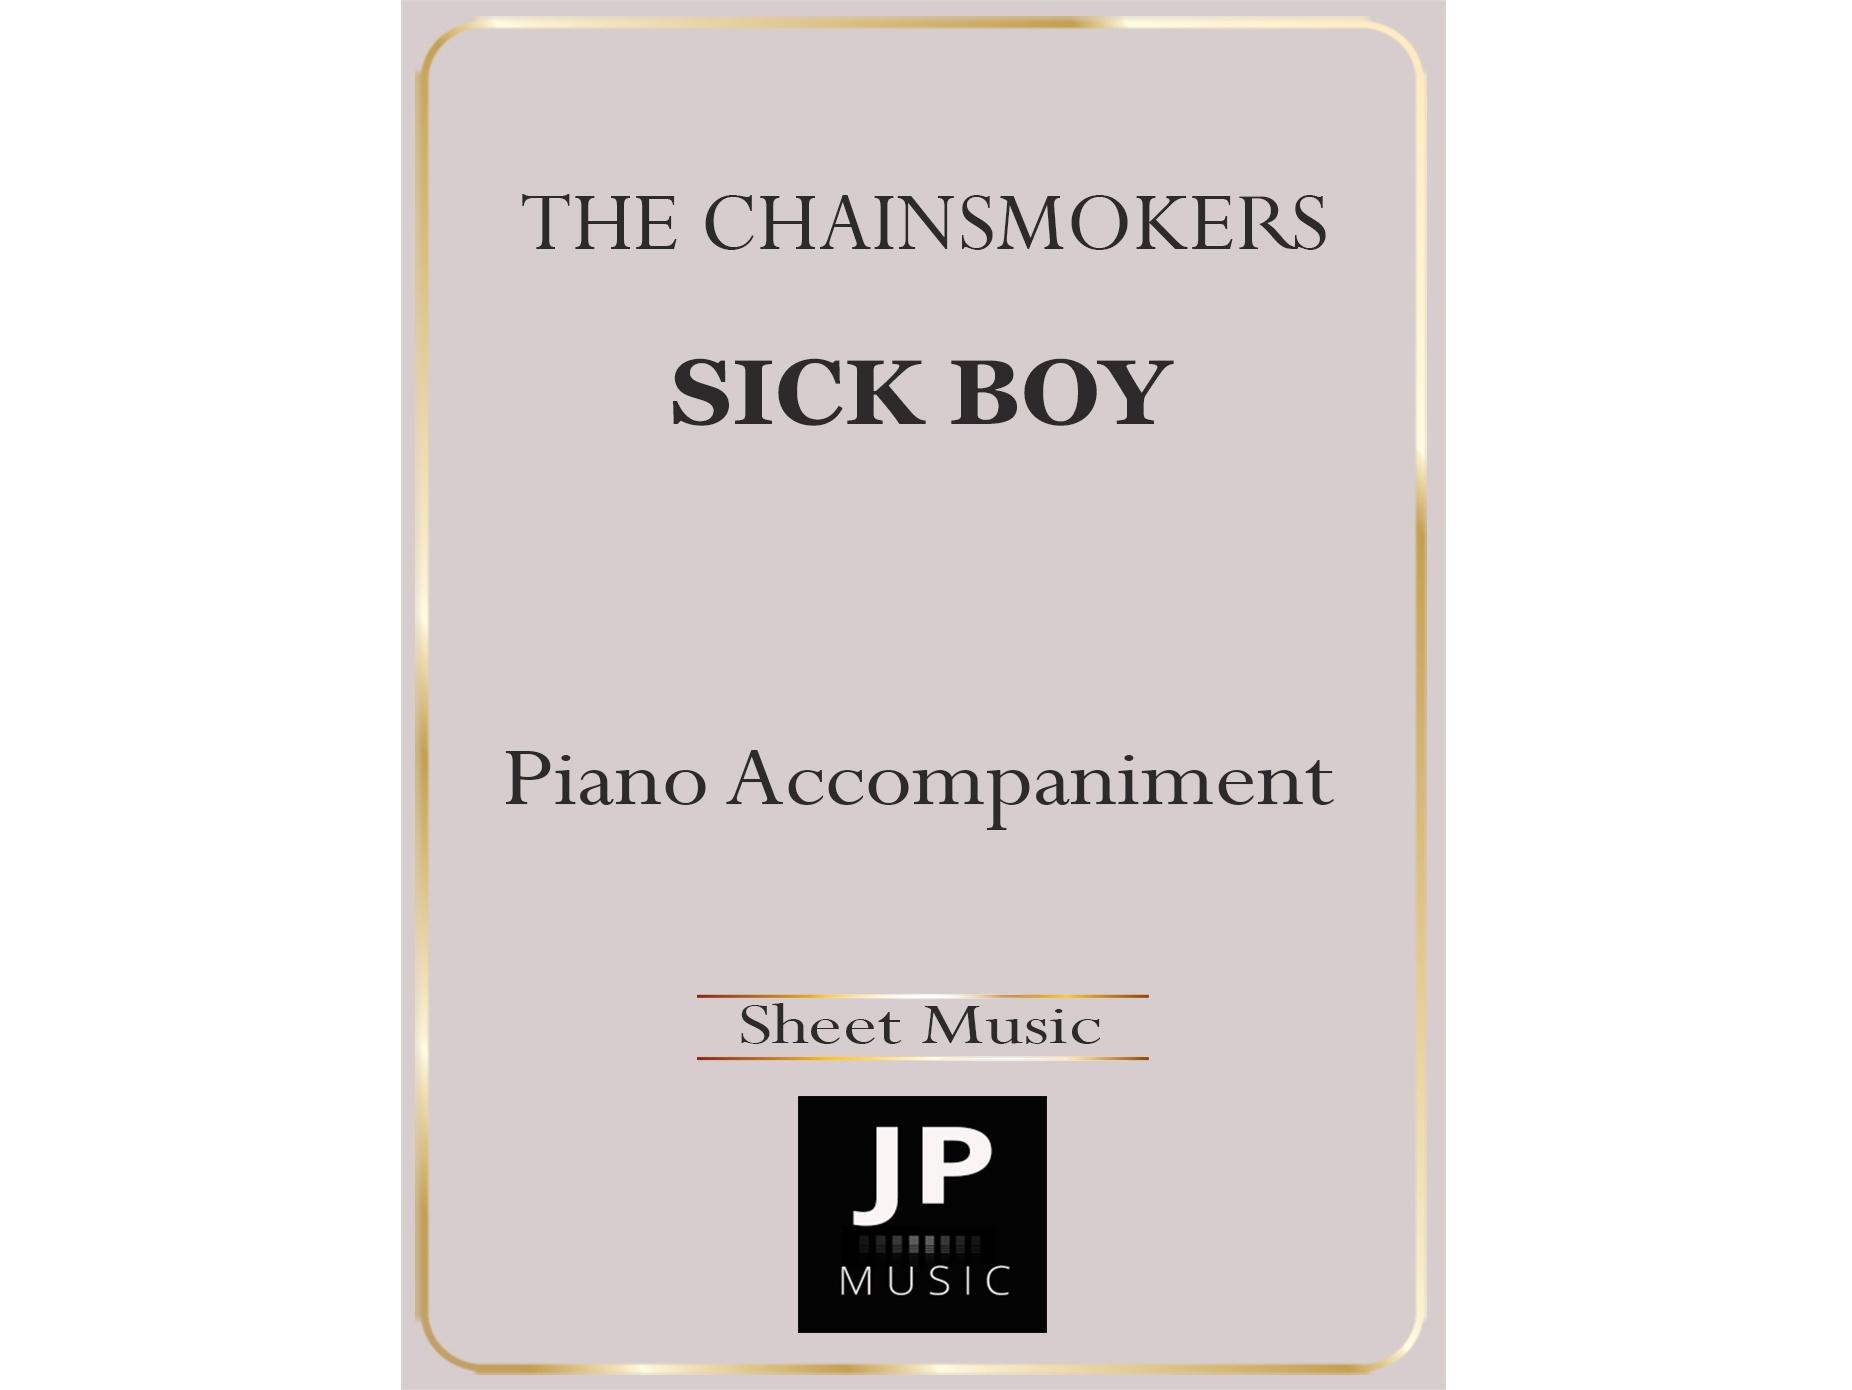 Sick Boy - Piano Accompaniment